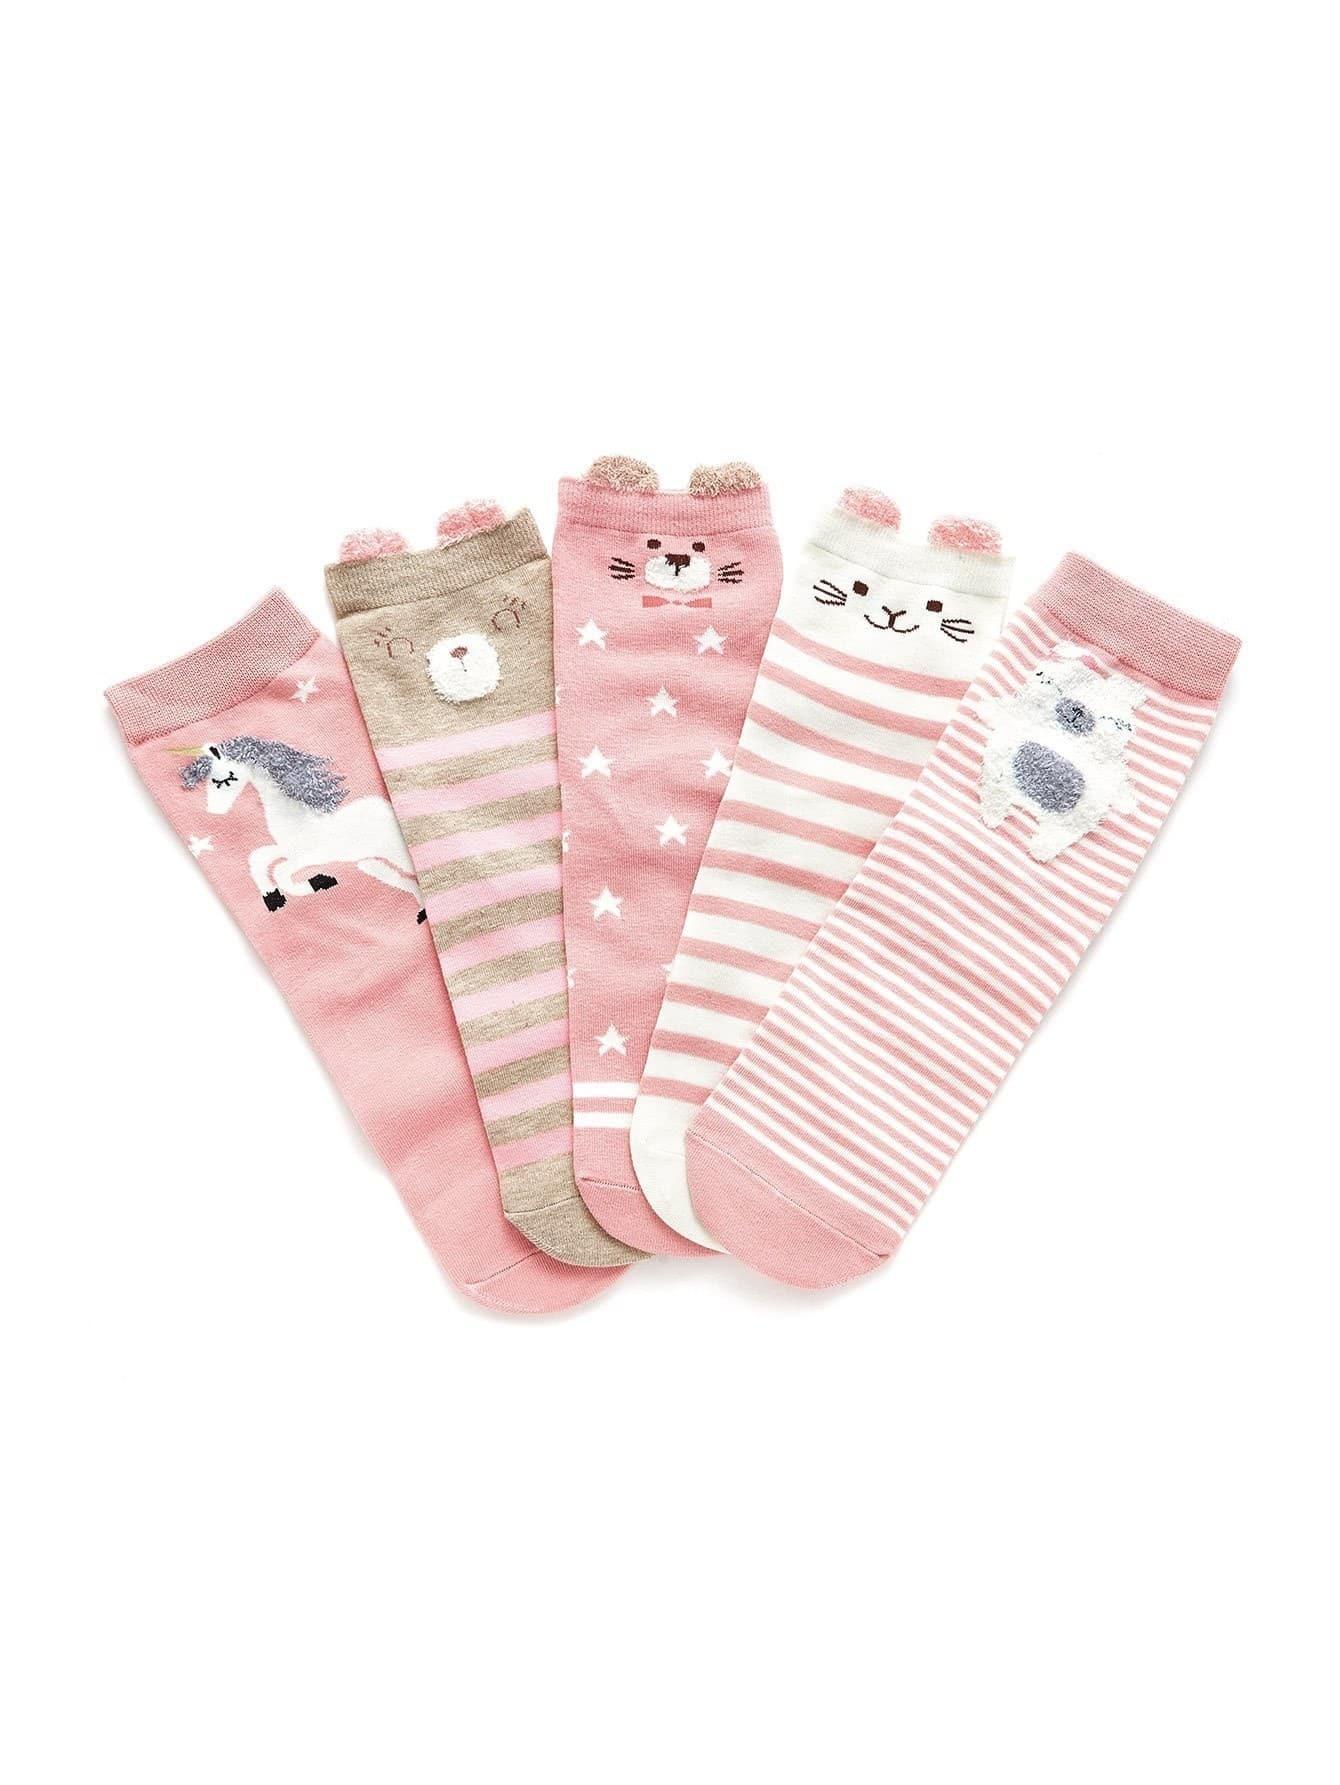 Animal Print Socks 5pairs женские чулки 1 5pairs